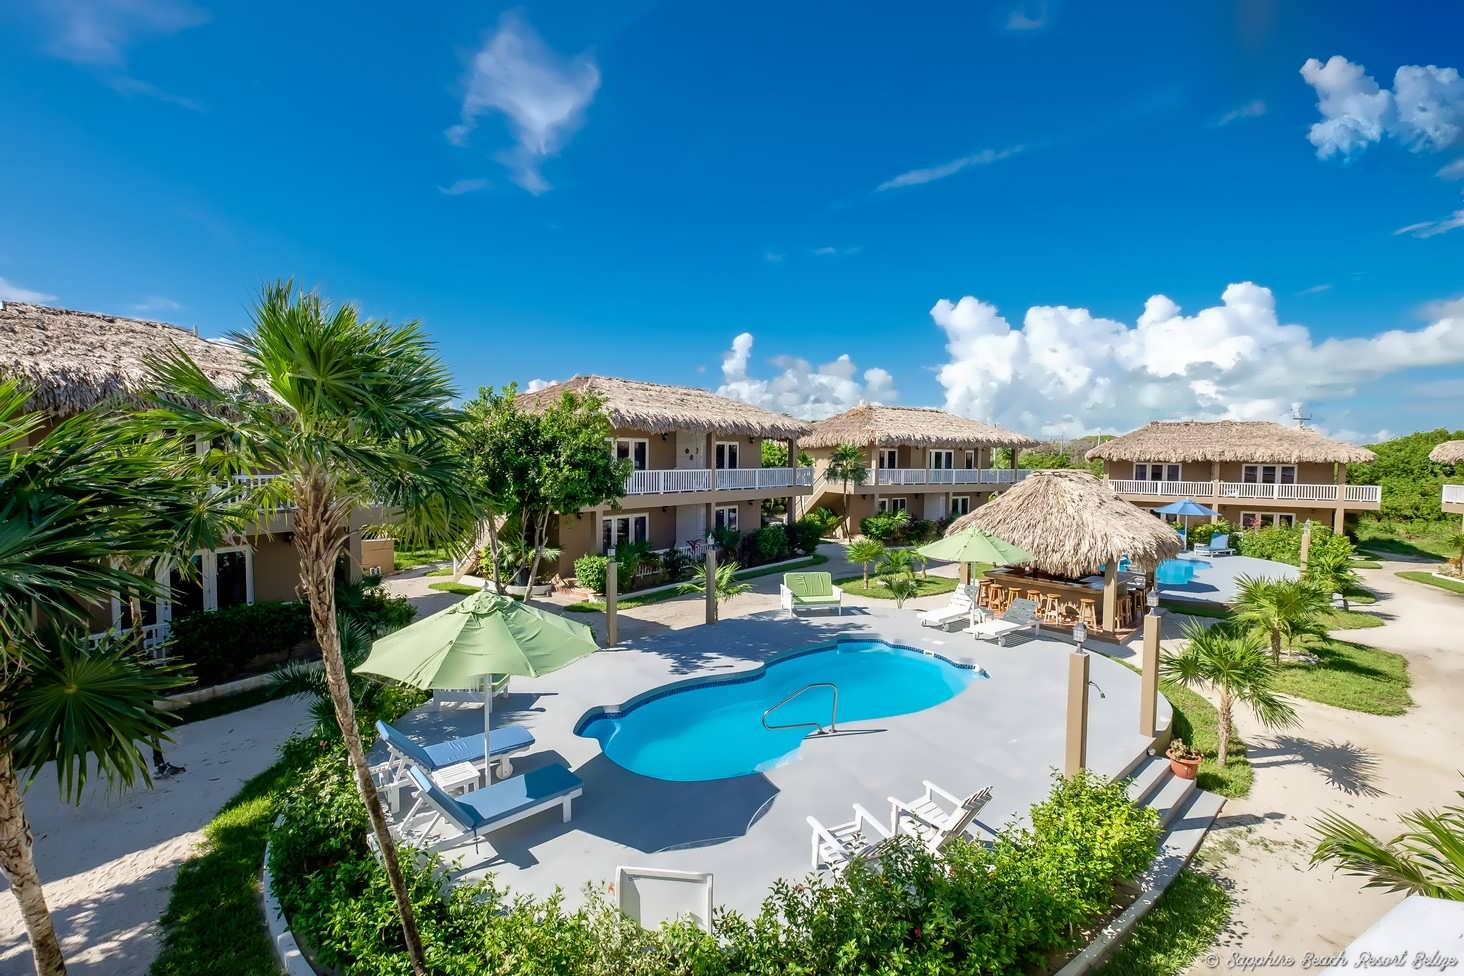 Sapphire Beach Resort Pools 20.jpg